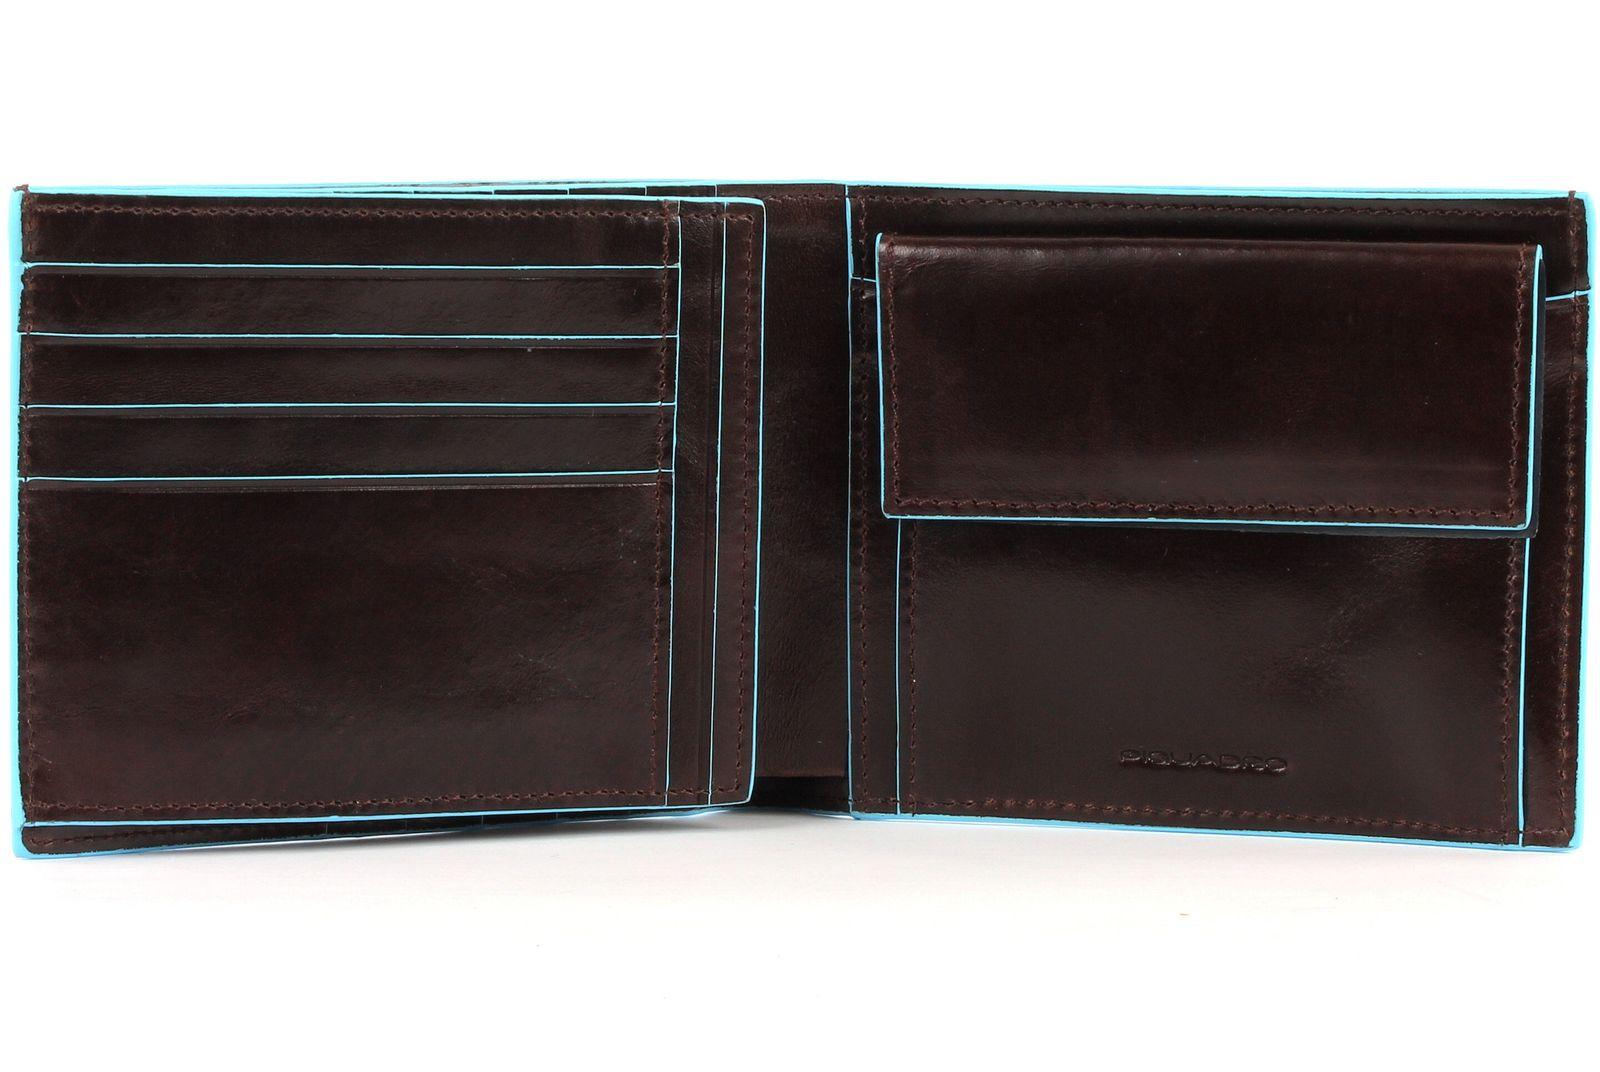 PIQUADRO Blue Square Wallet Horizontal Mogano